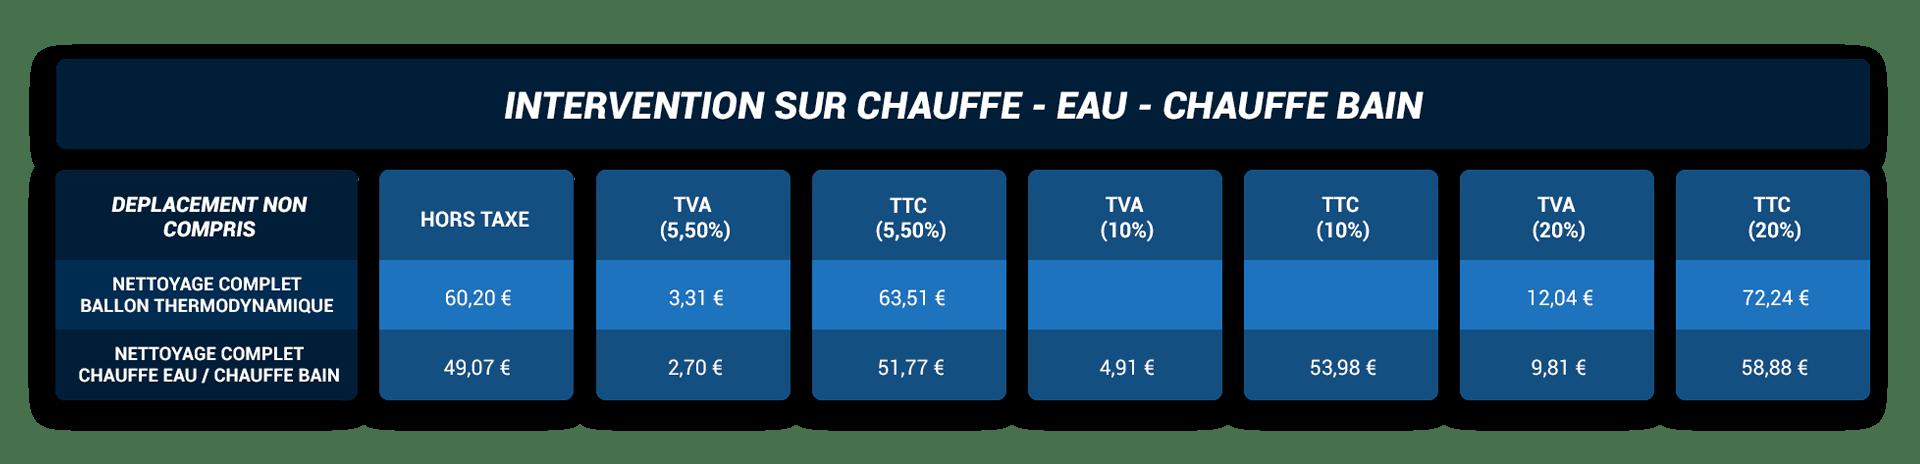 https://www.depannage-mallet.fr/wp-content/uploads/2020/09/intrevention-sur-chauffe-eau-chauffe-bain.png